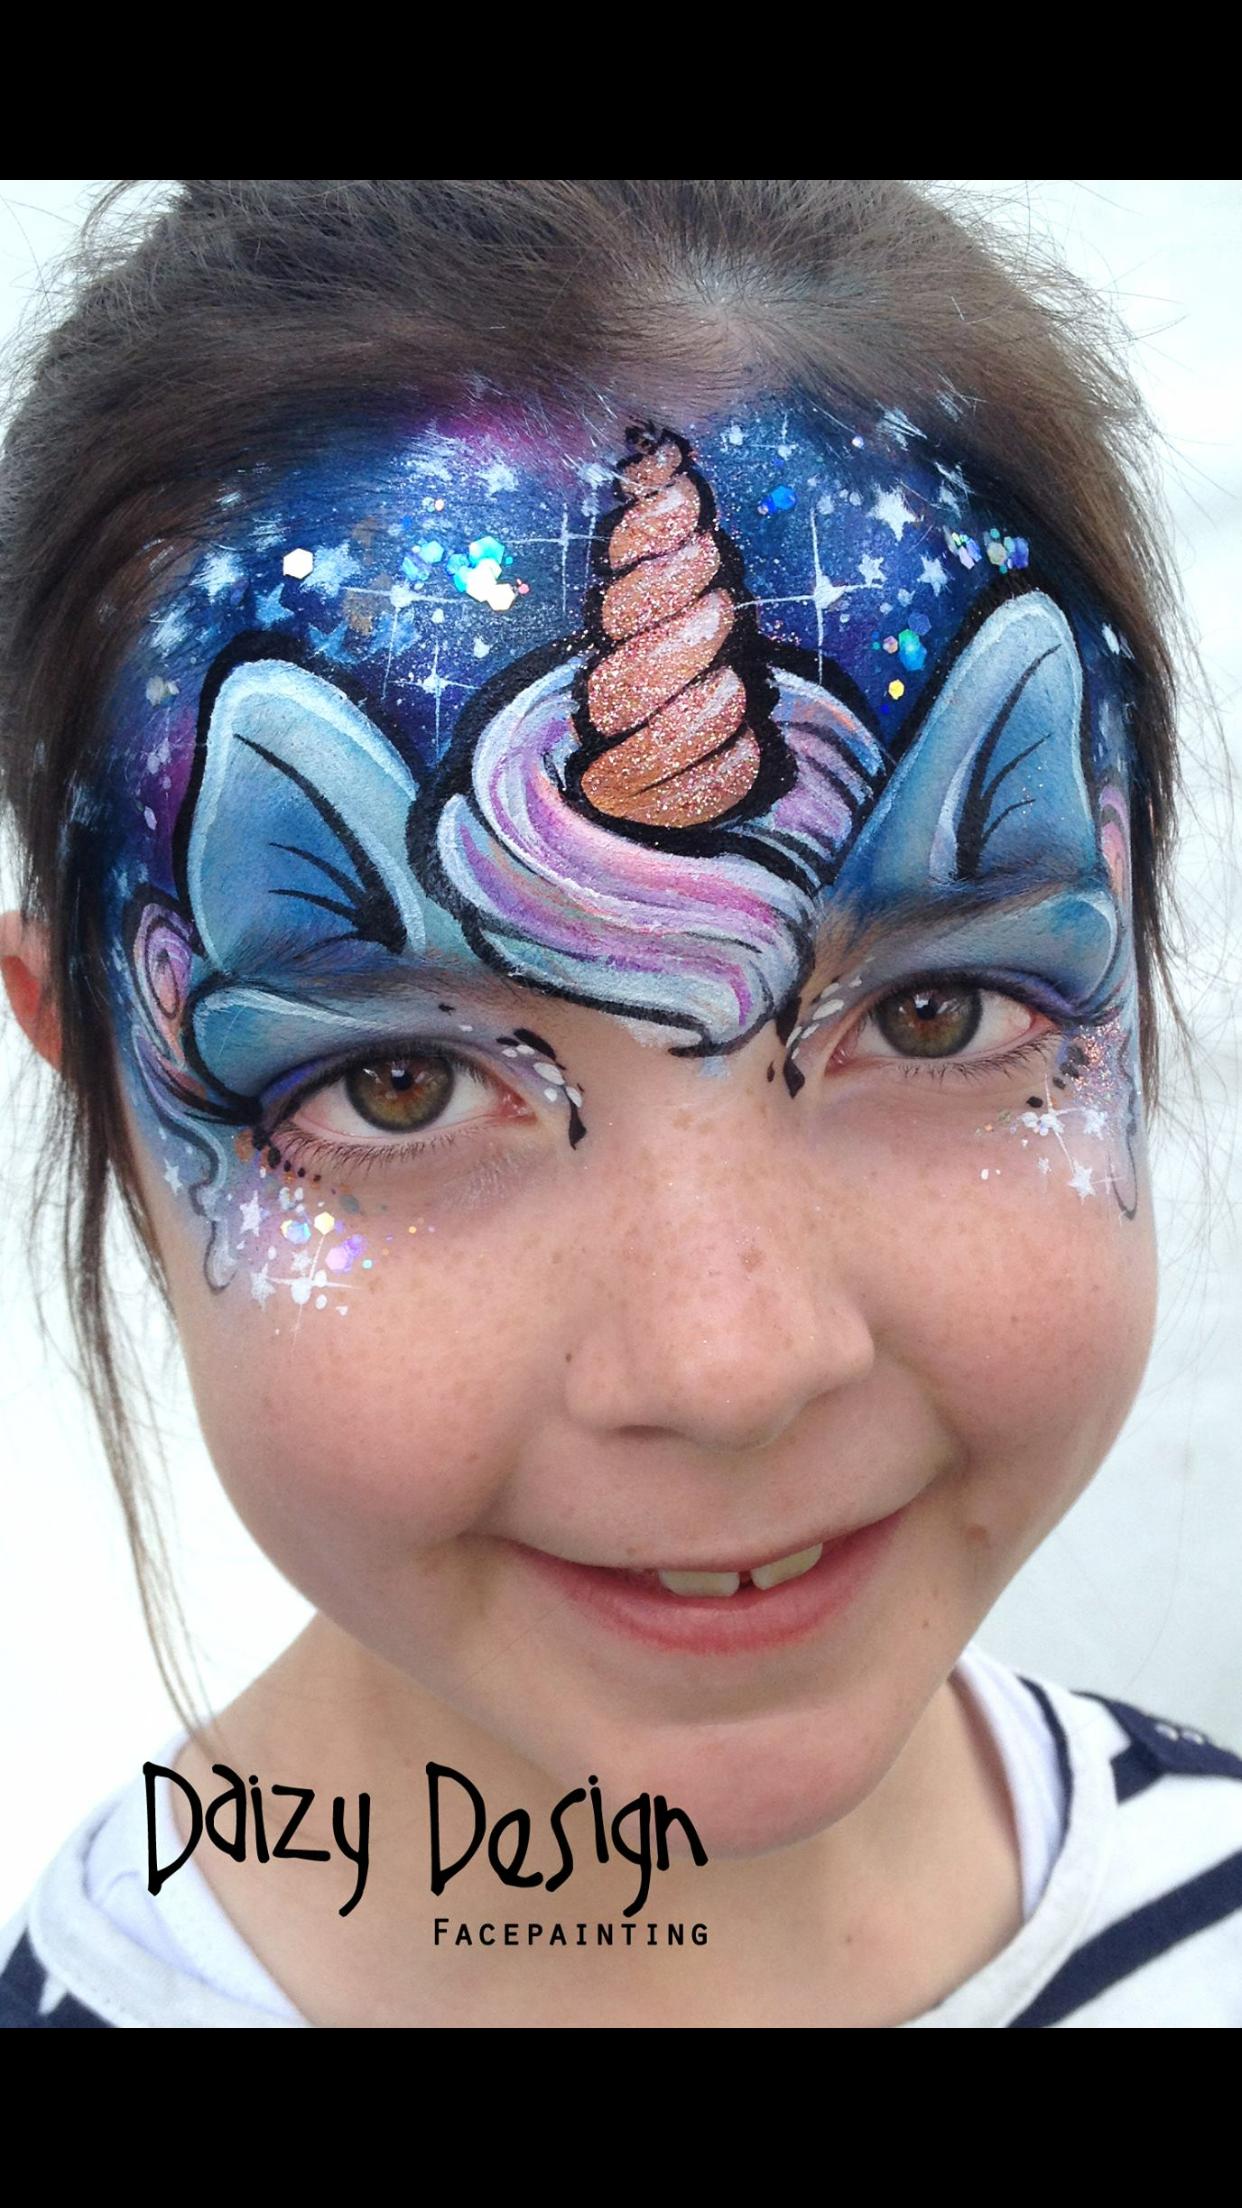 Pin By Meltem Karaosman On Yuz Boyama Face Painting Unicorn Face Painting Designs Christmas Face Painting